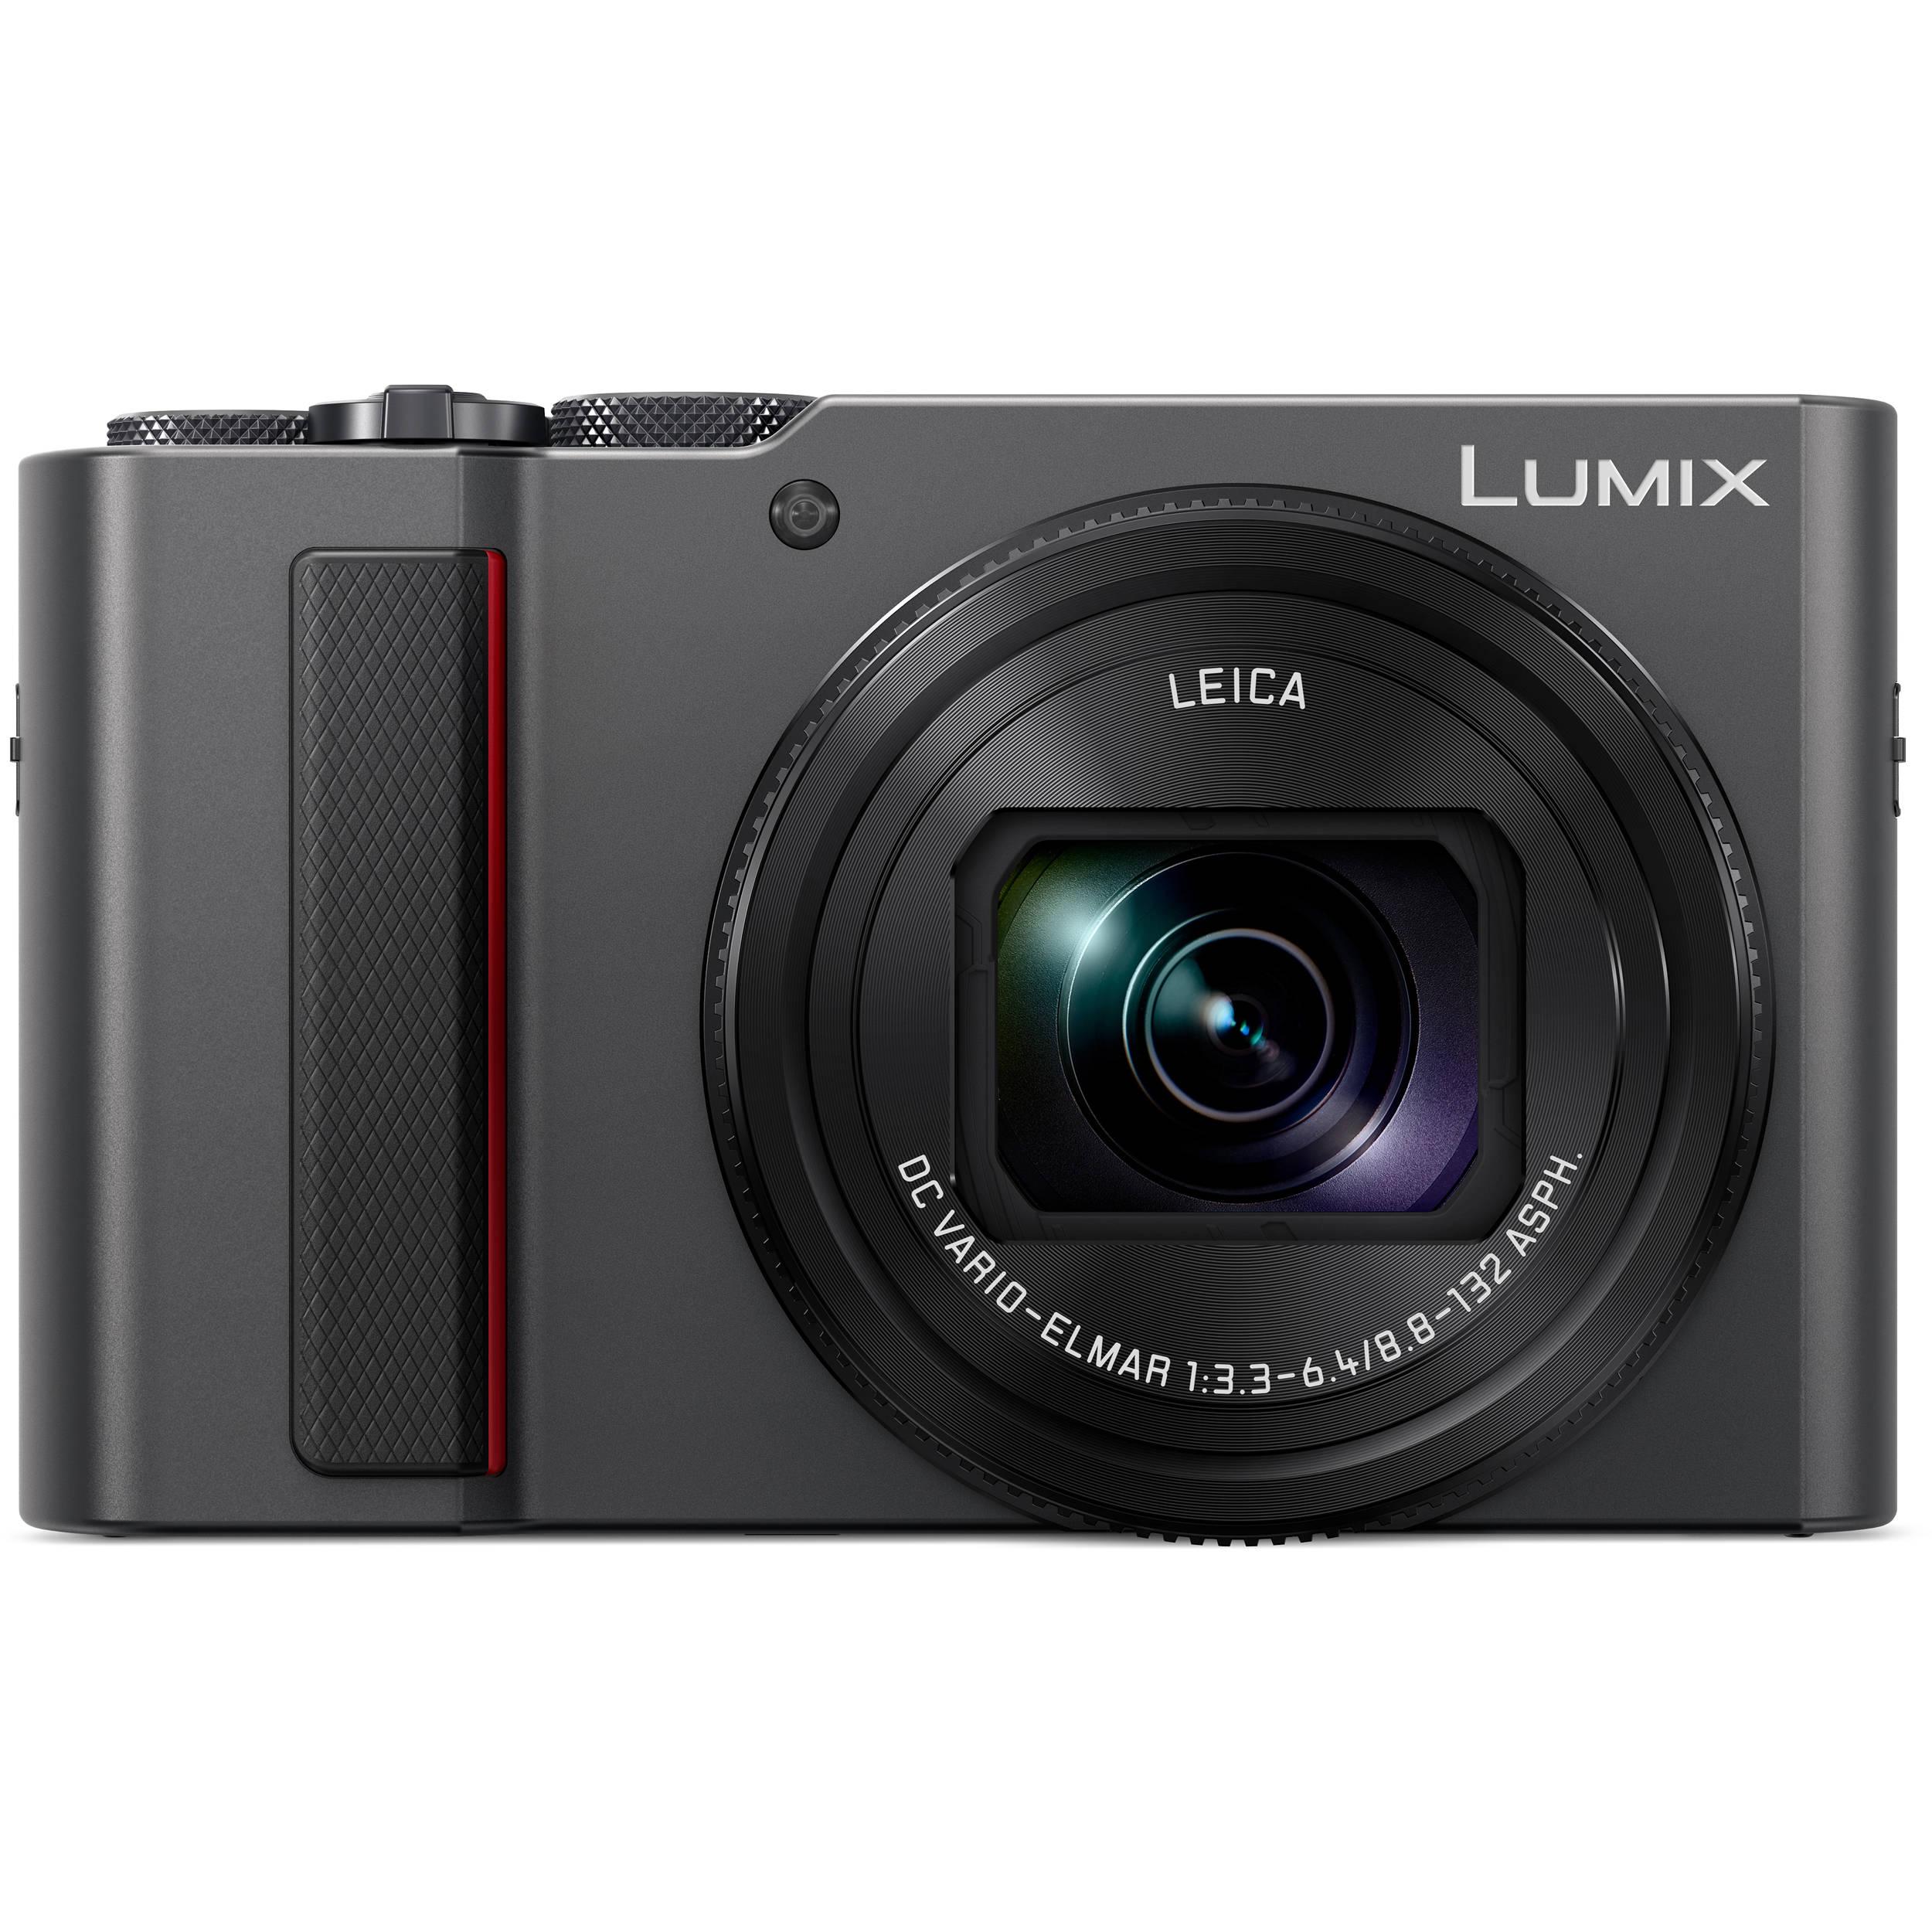 Panasonic Lumix Dc Zs200 Digital Camera Silver Leica C Lux Light Gold